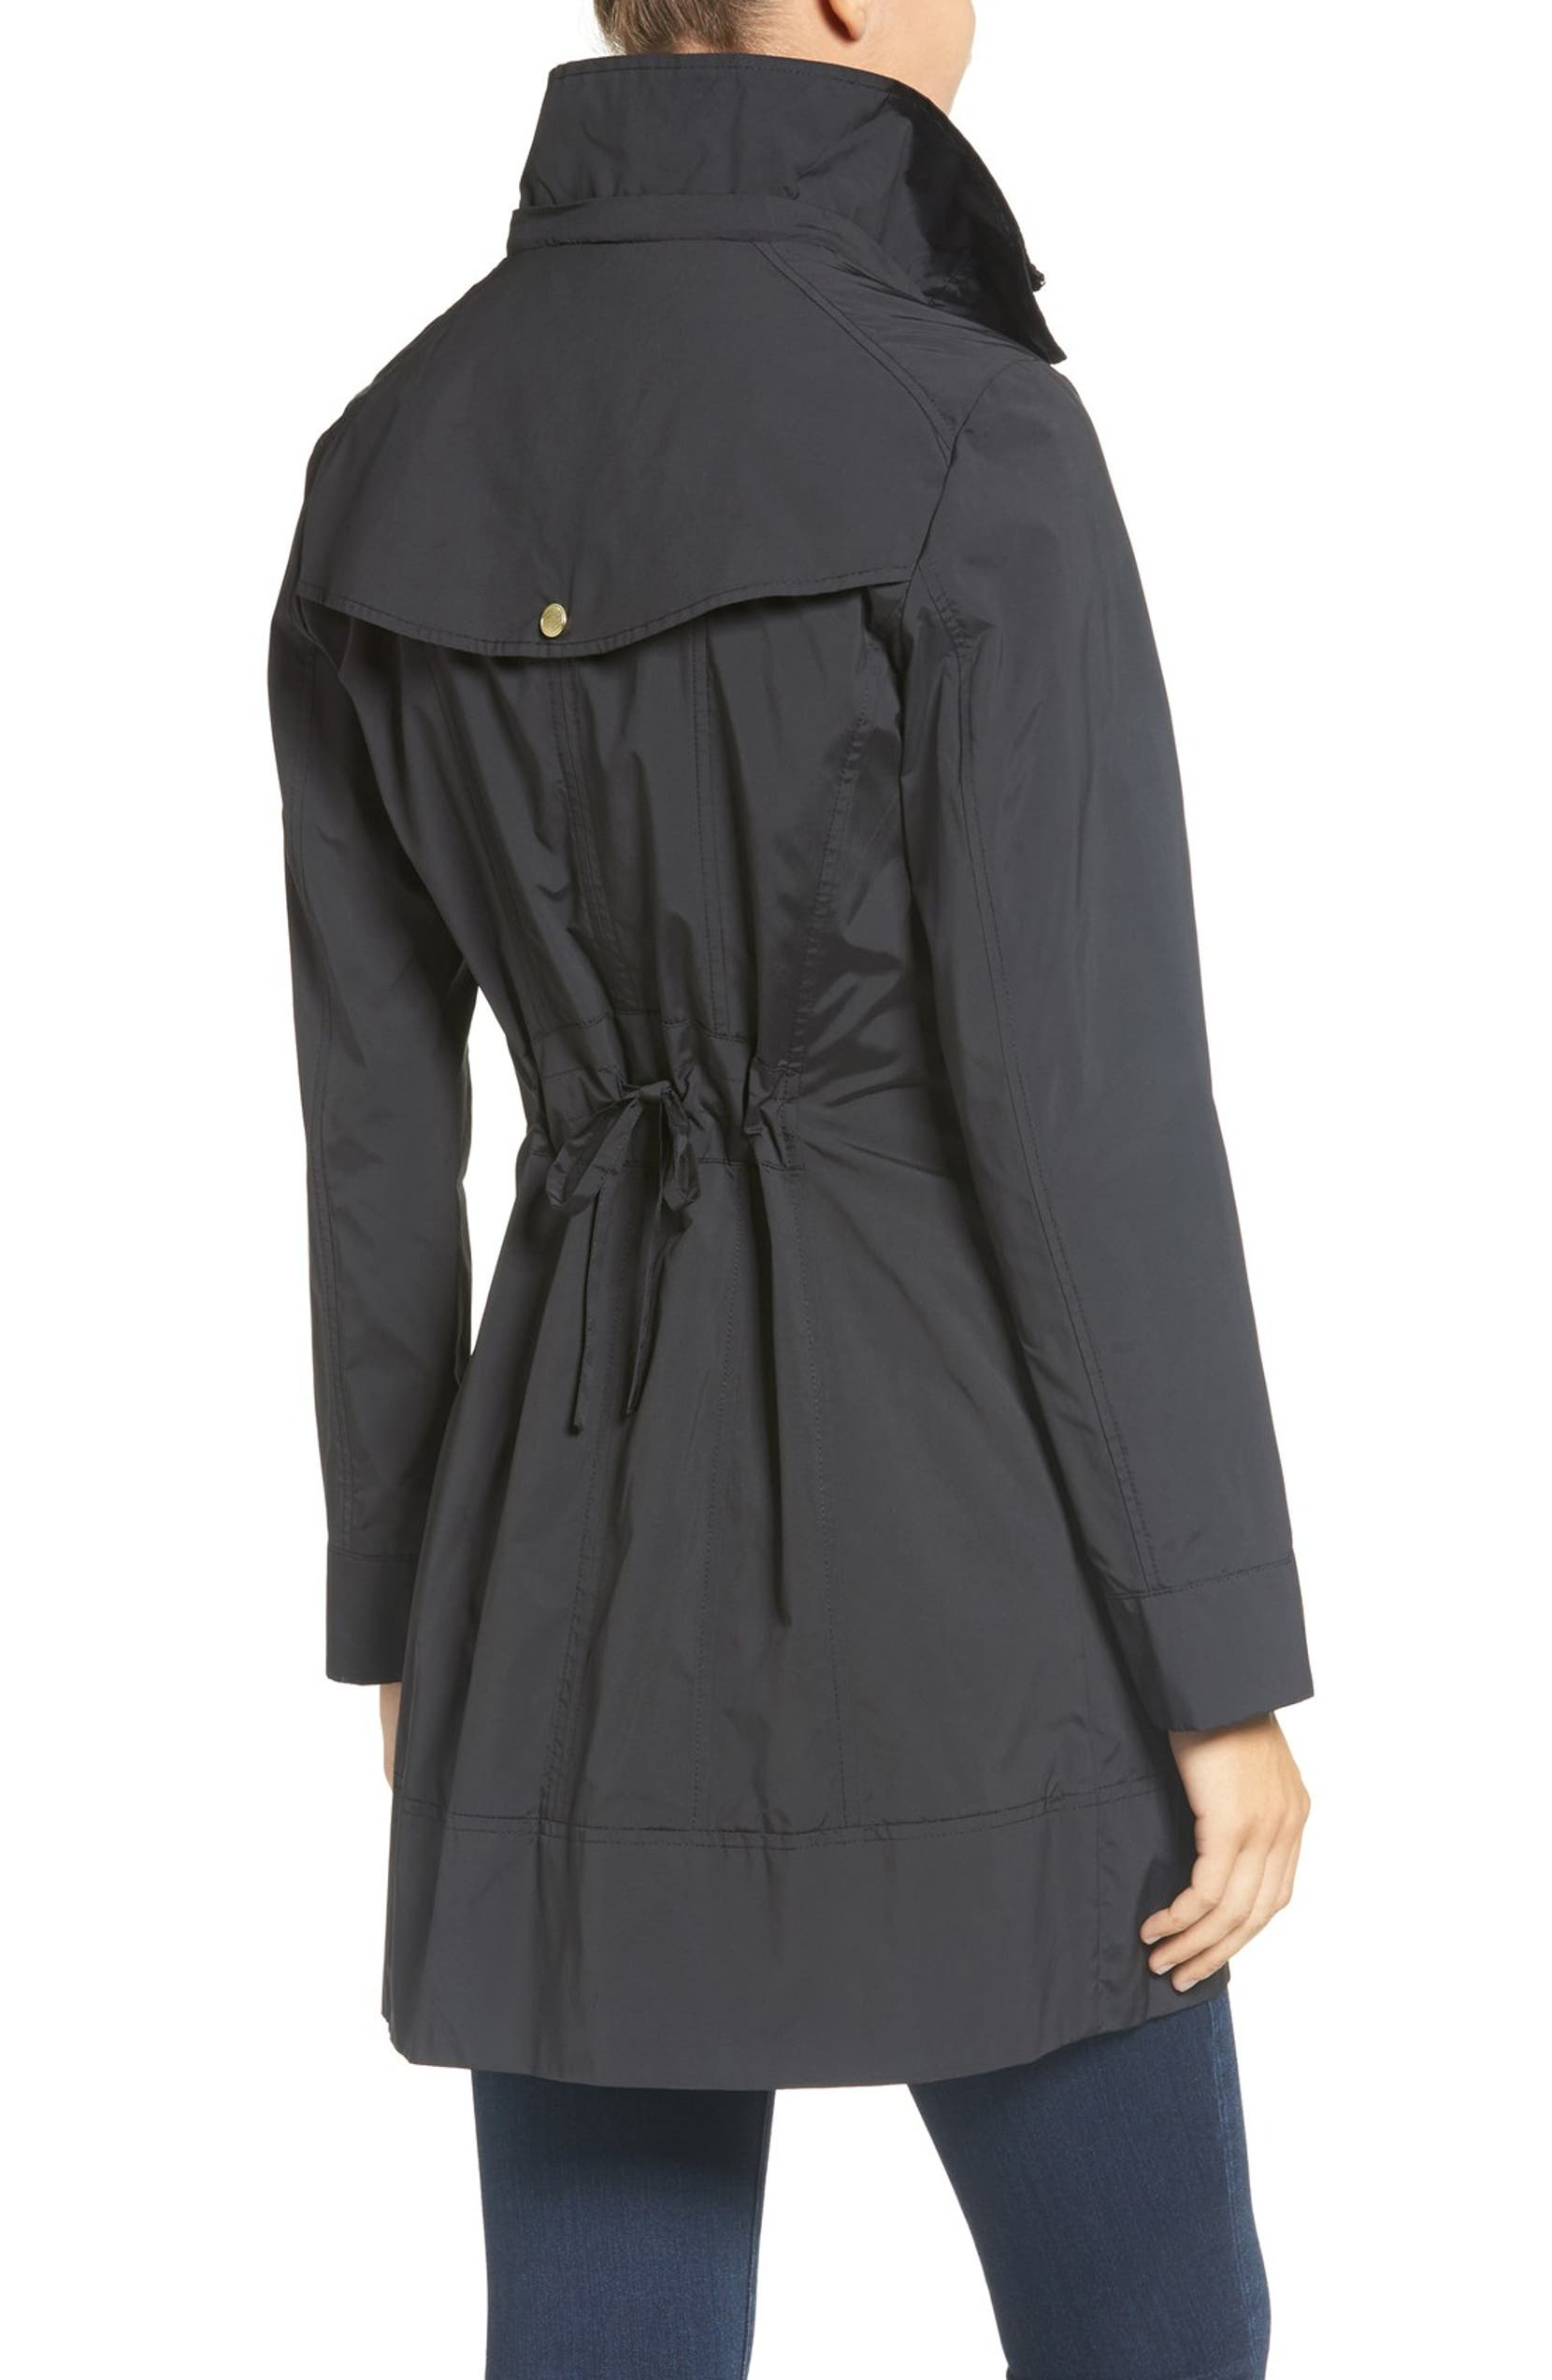 fe1fbdd44c6c Cole Haan Signature Back Bow Packable Hooded Raincoat (Regular ...